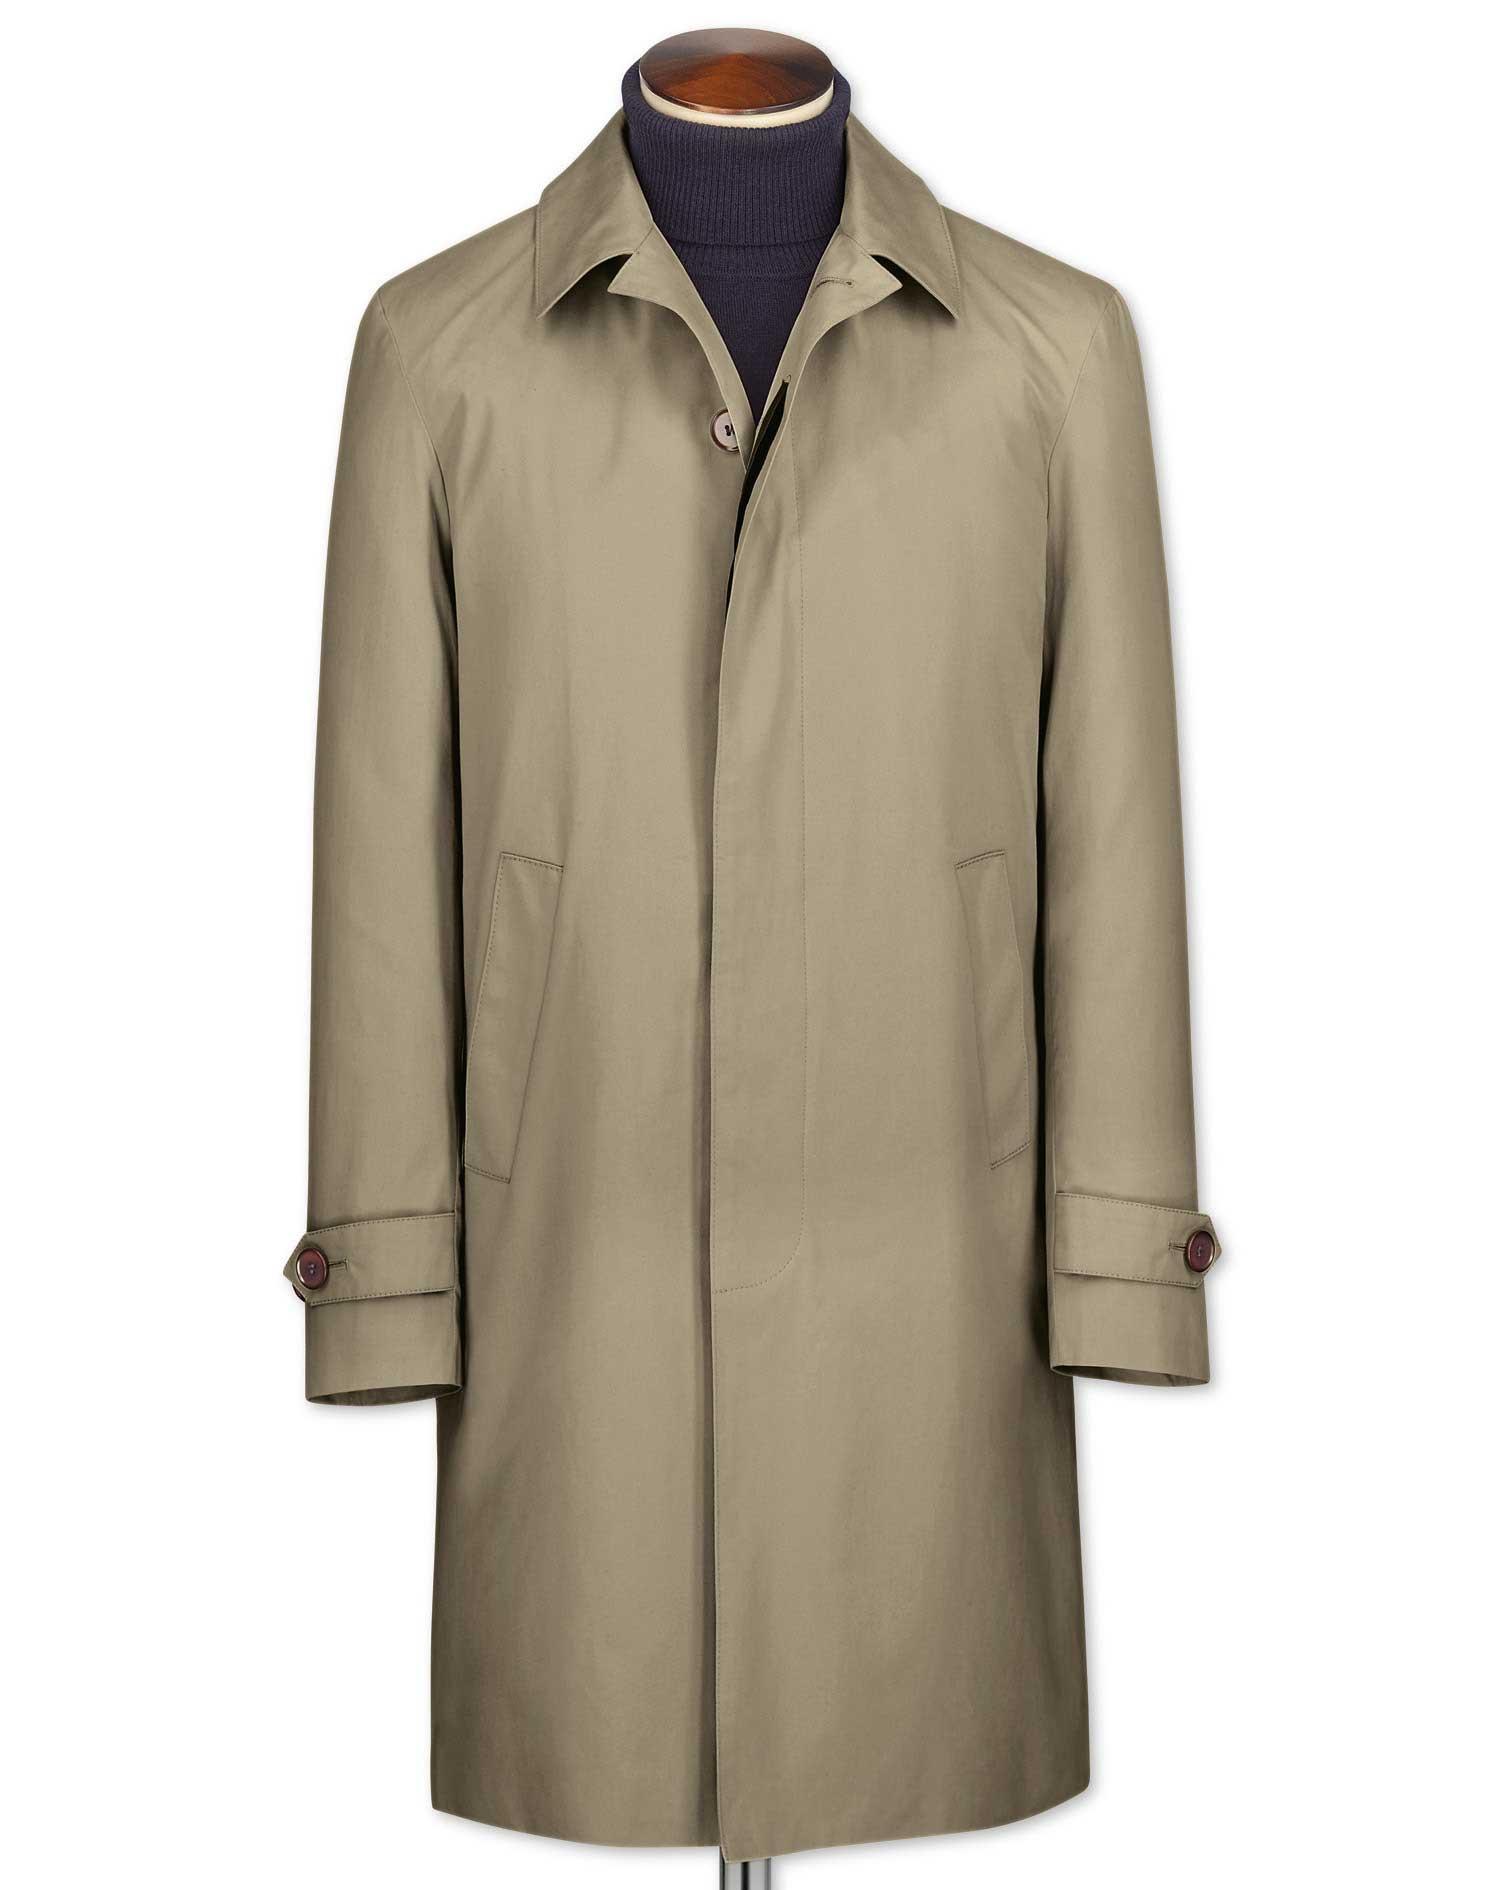 Classic fit stone raincoat | Charles Tyrwhitt